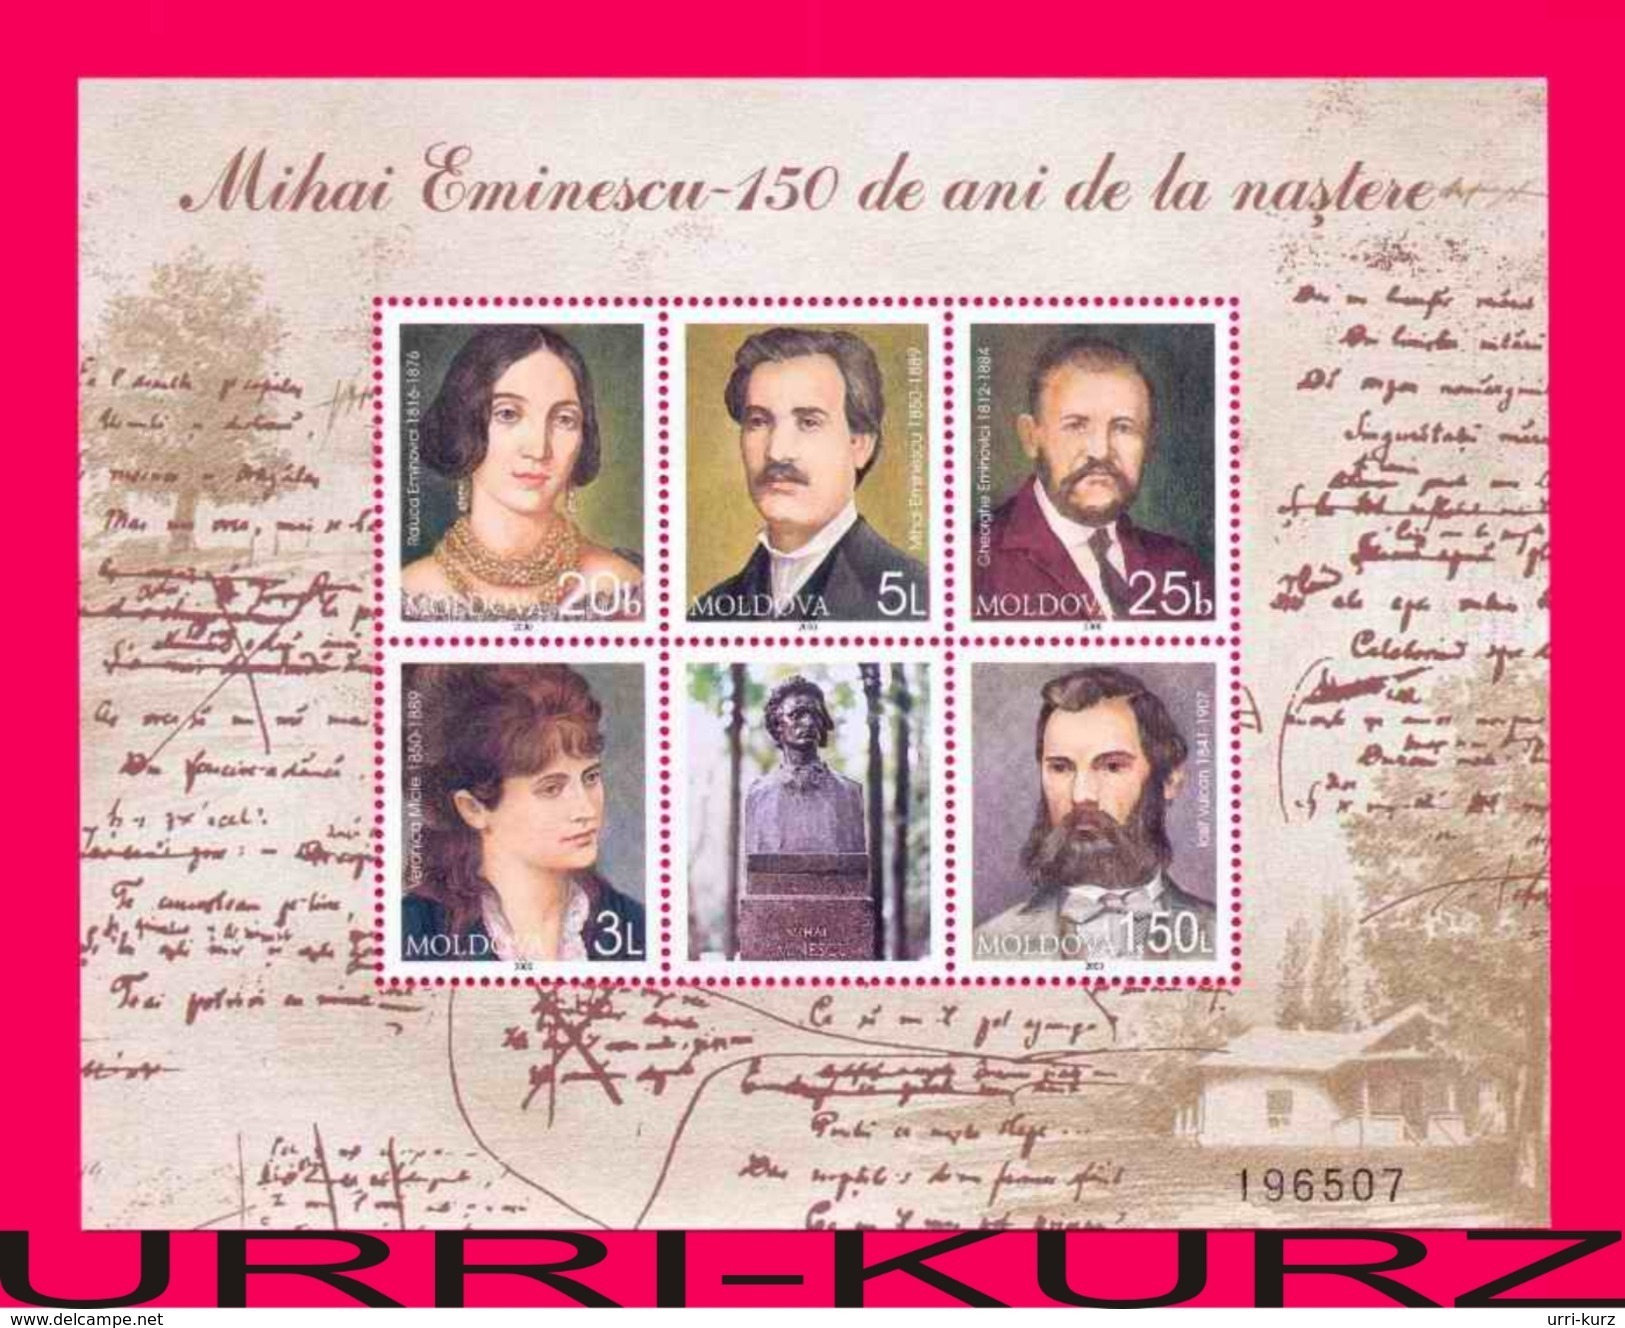 MOLDOVA 2000 Famous People Writer Poet Mihai Eminescu Family Souvenir Sheet Mi Bl.21(345-349) Sc341 MNH - Moldova